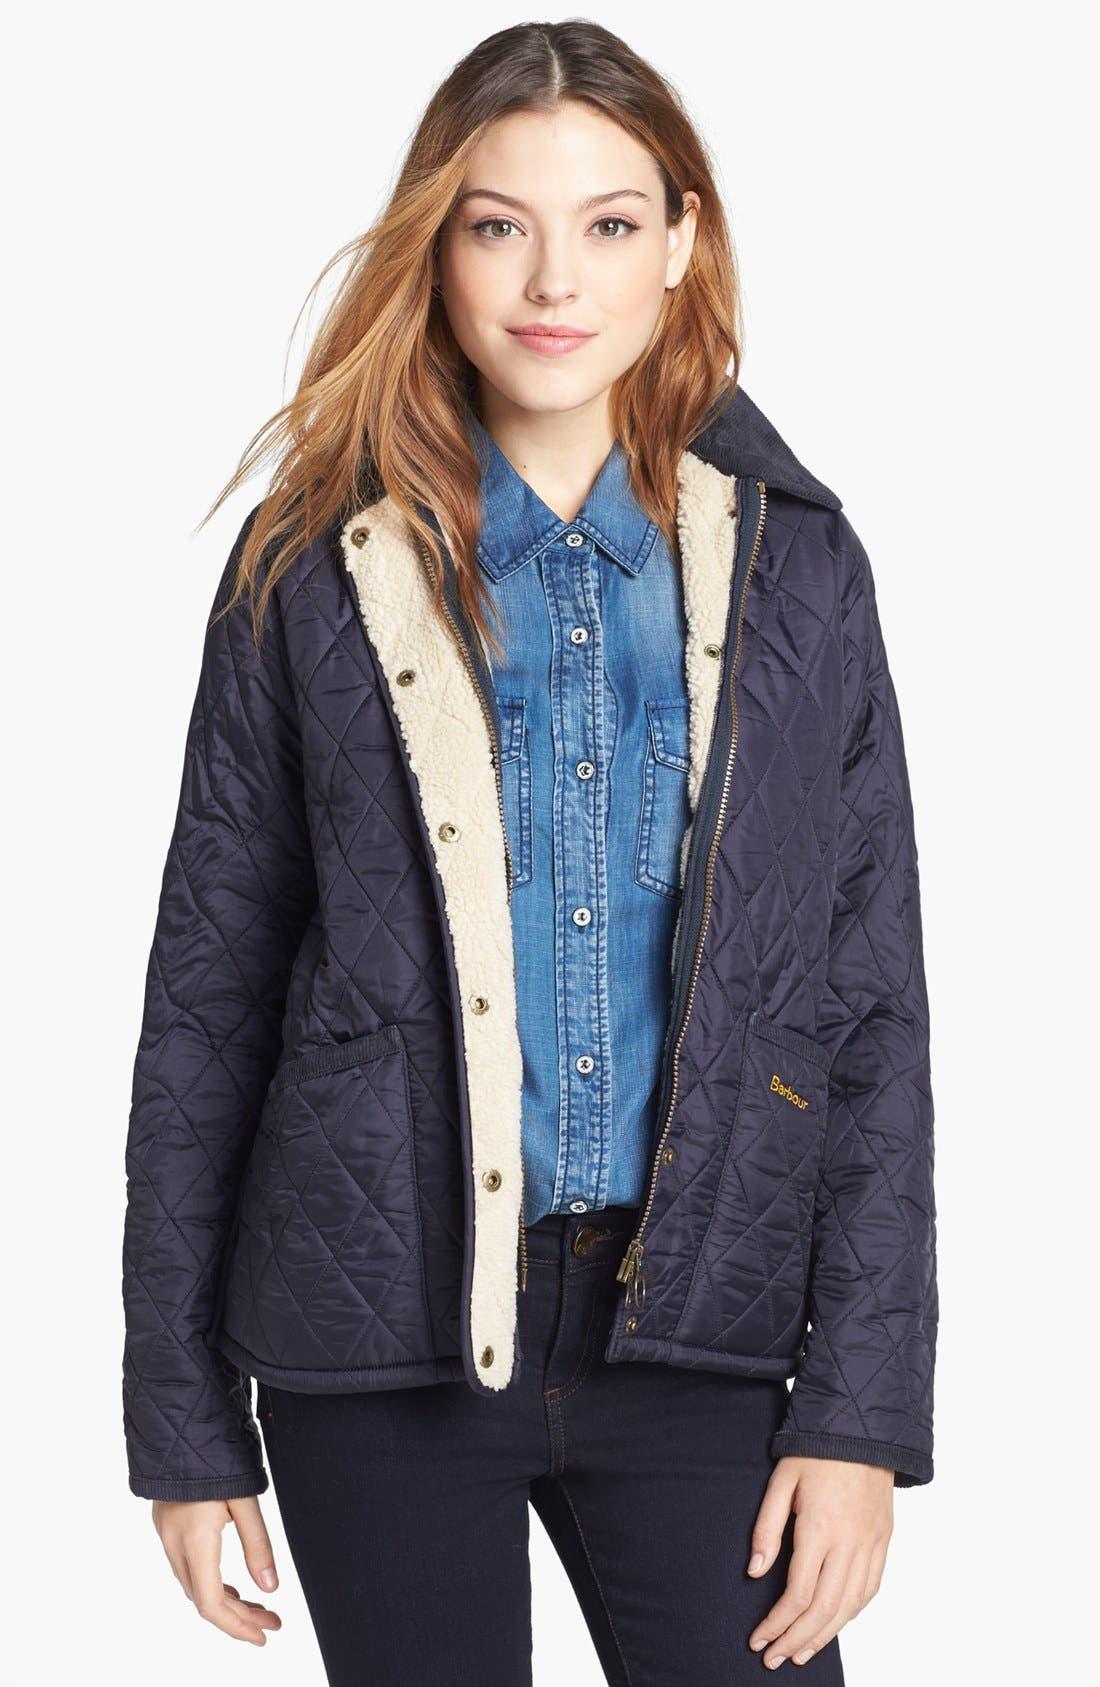 Main Image - Barbour 'Vintage Liddesdale' Quilted Jacket